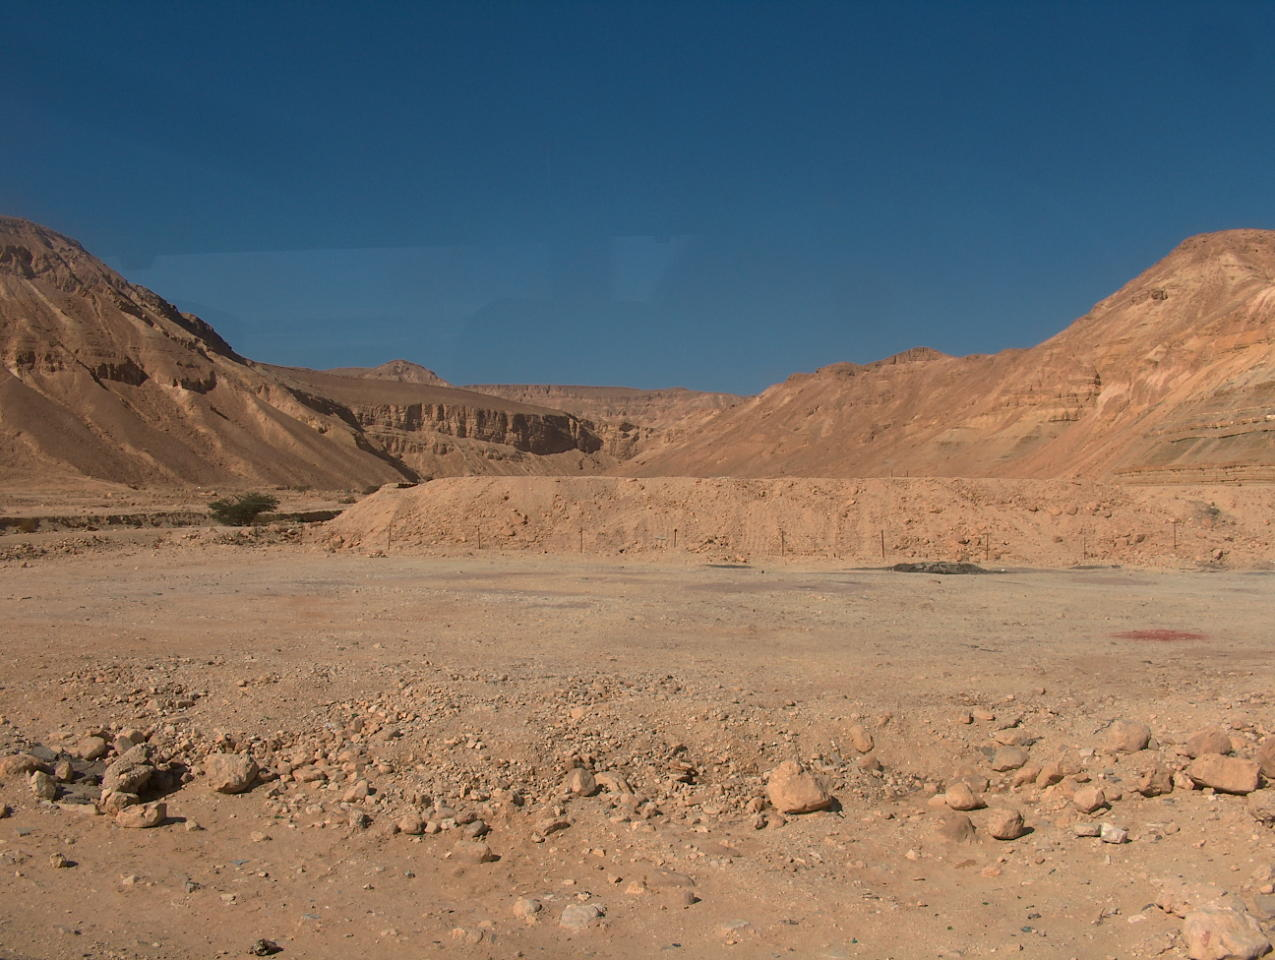 Wüste In Israel